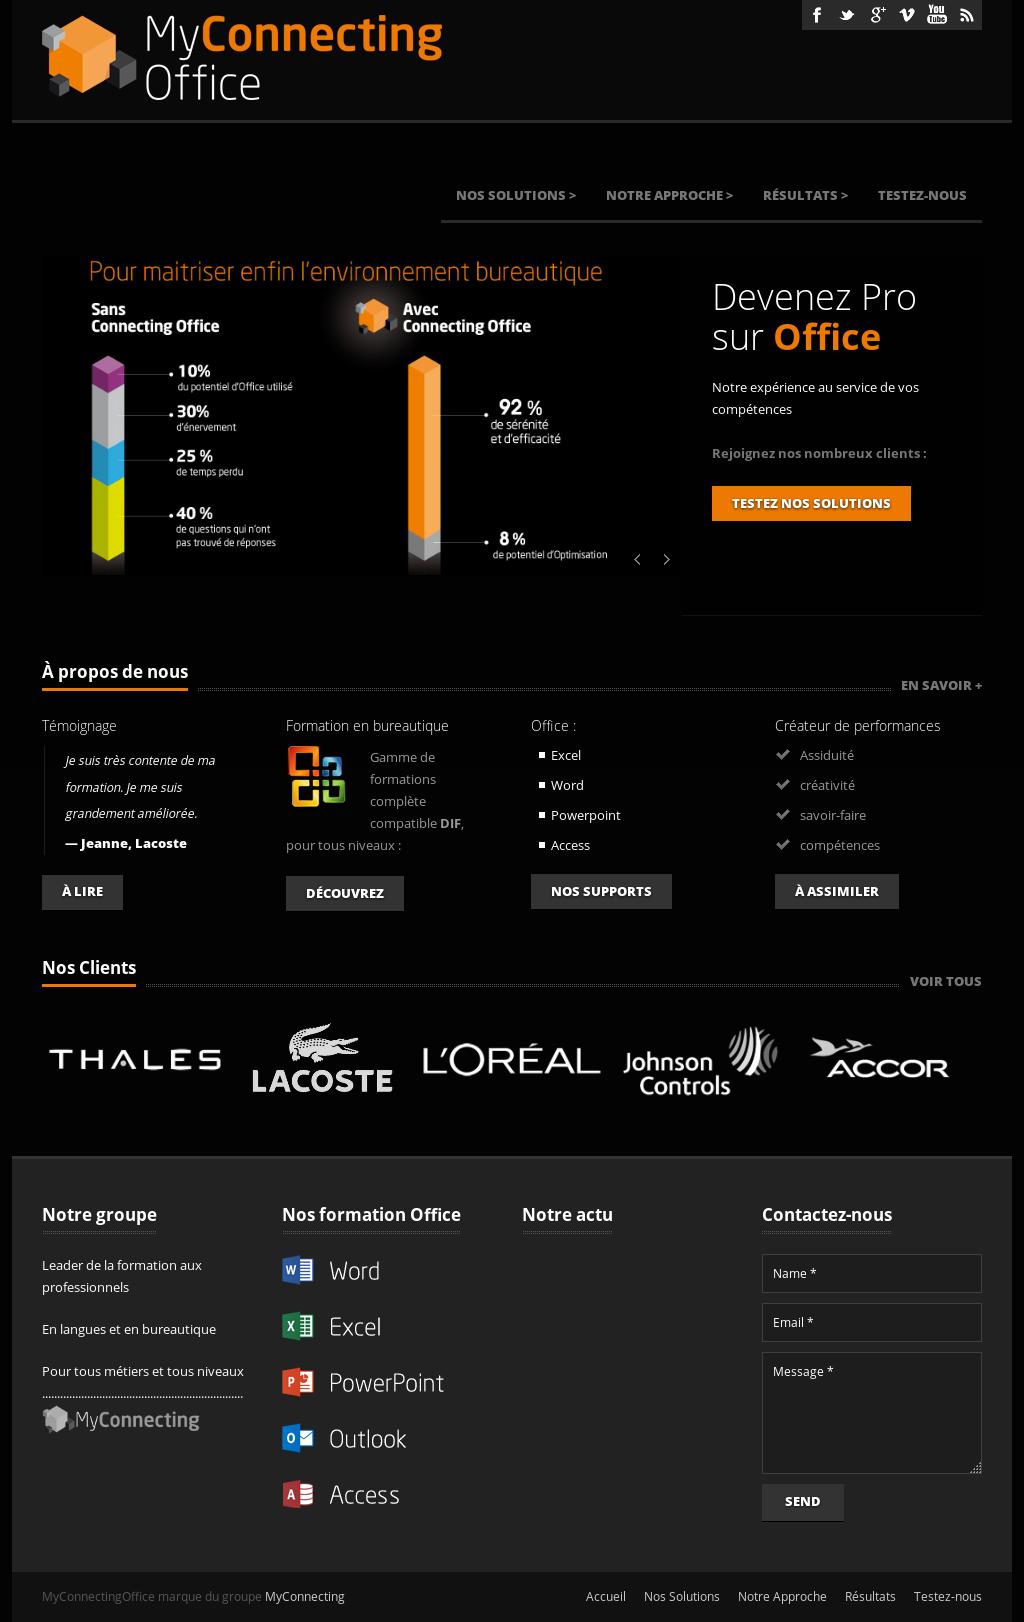 77b96ebf14f Myconnectingoffice Competitors